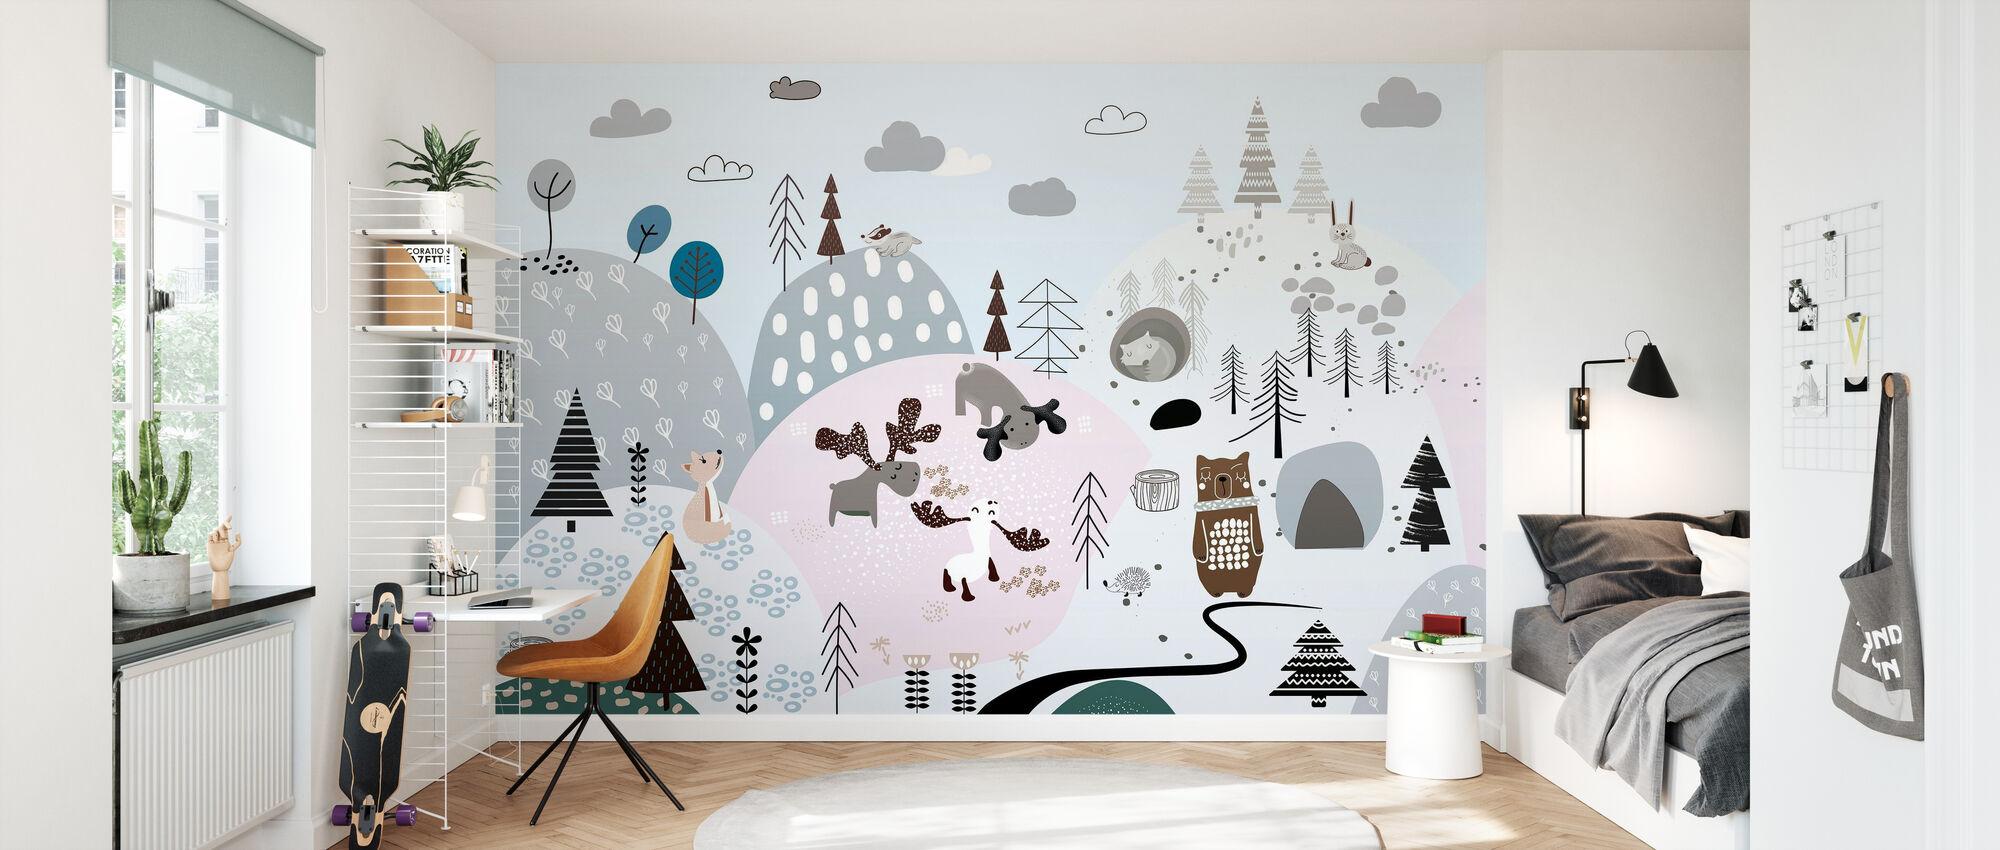 Friendly Forest Hills - Wallpaper - Kids Room